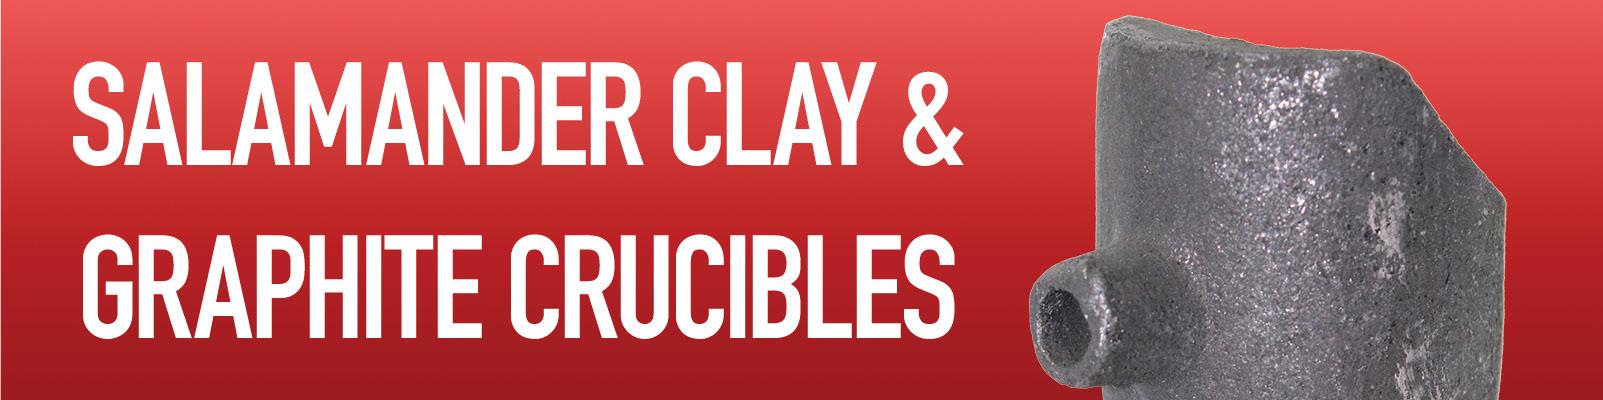 Salamander Clay / Graphite Crucibles